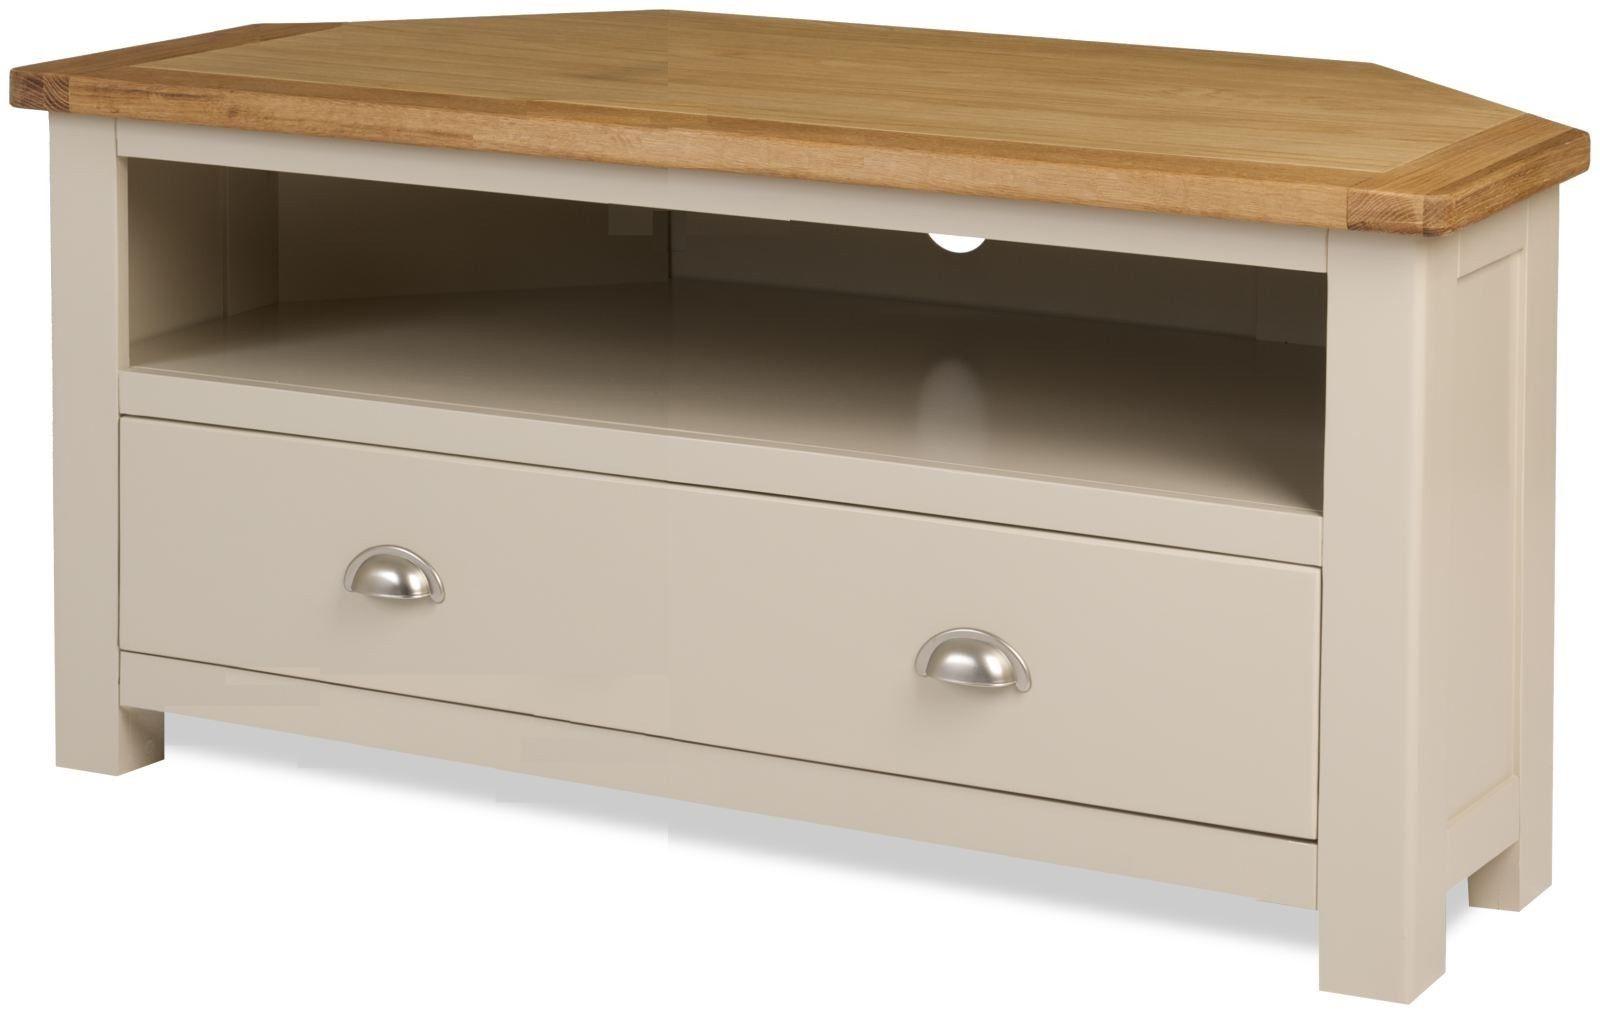 Popular Melton Stone Colour Painted Oak Corner Widescreen Lcd Plasma Tv For Oak Widescreen Tv Units (View 20 of 20)